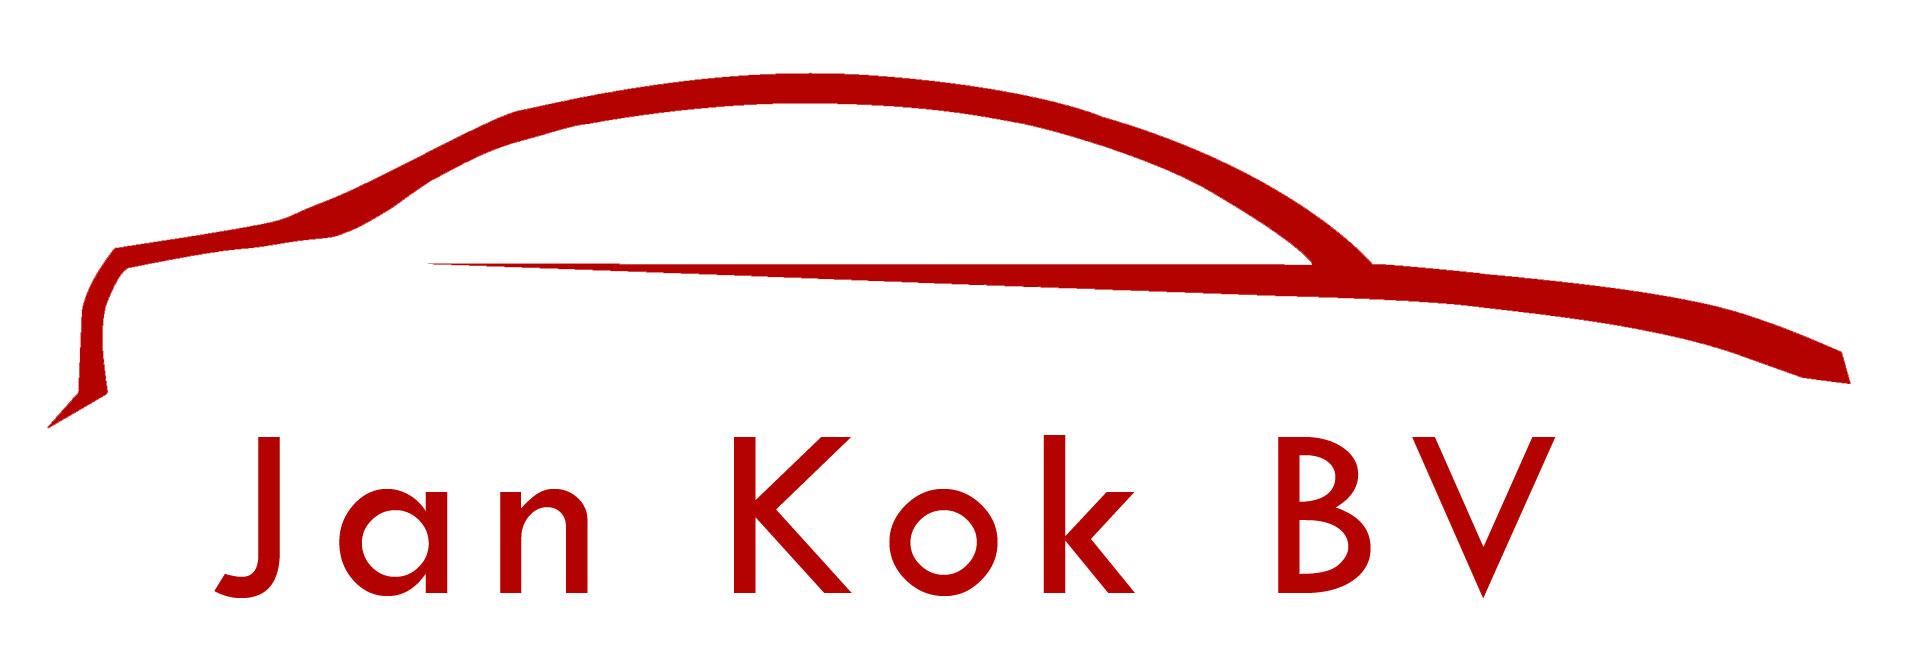 Jan Kok logo rood (3)